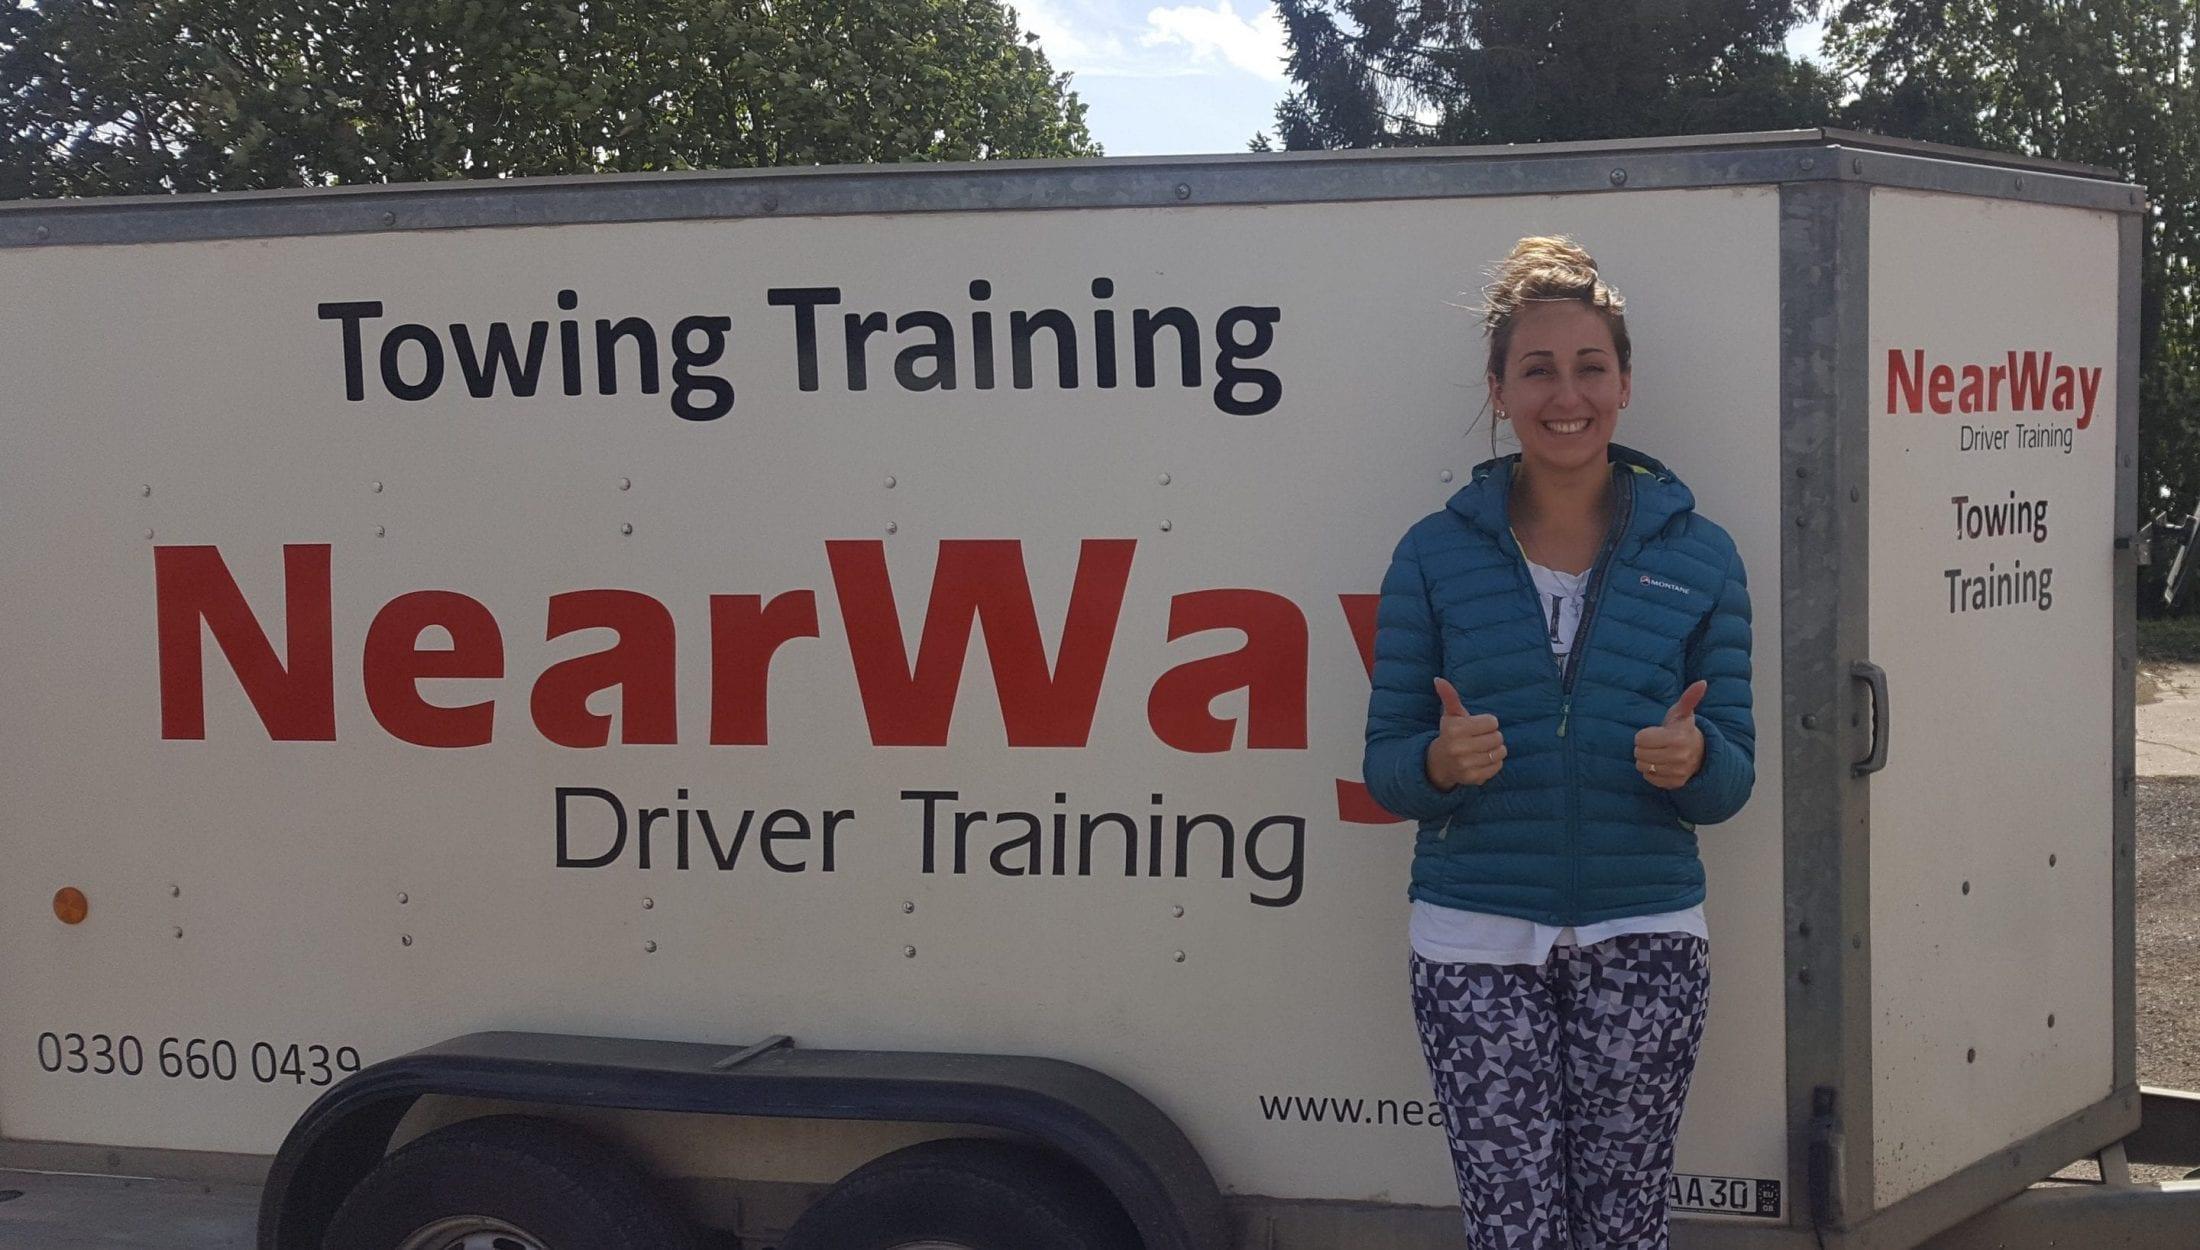 Abi Penrose Towing Test Nearway Driver Training